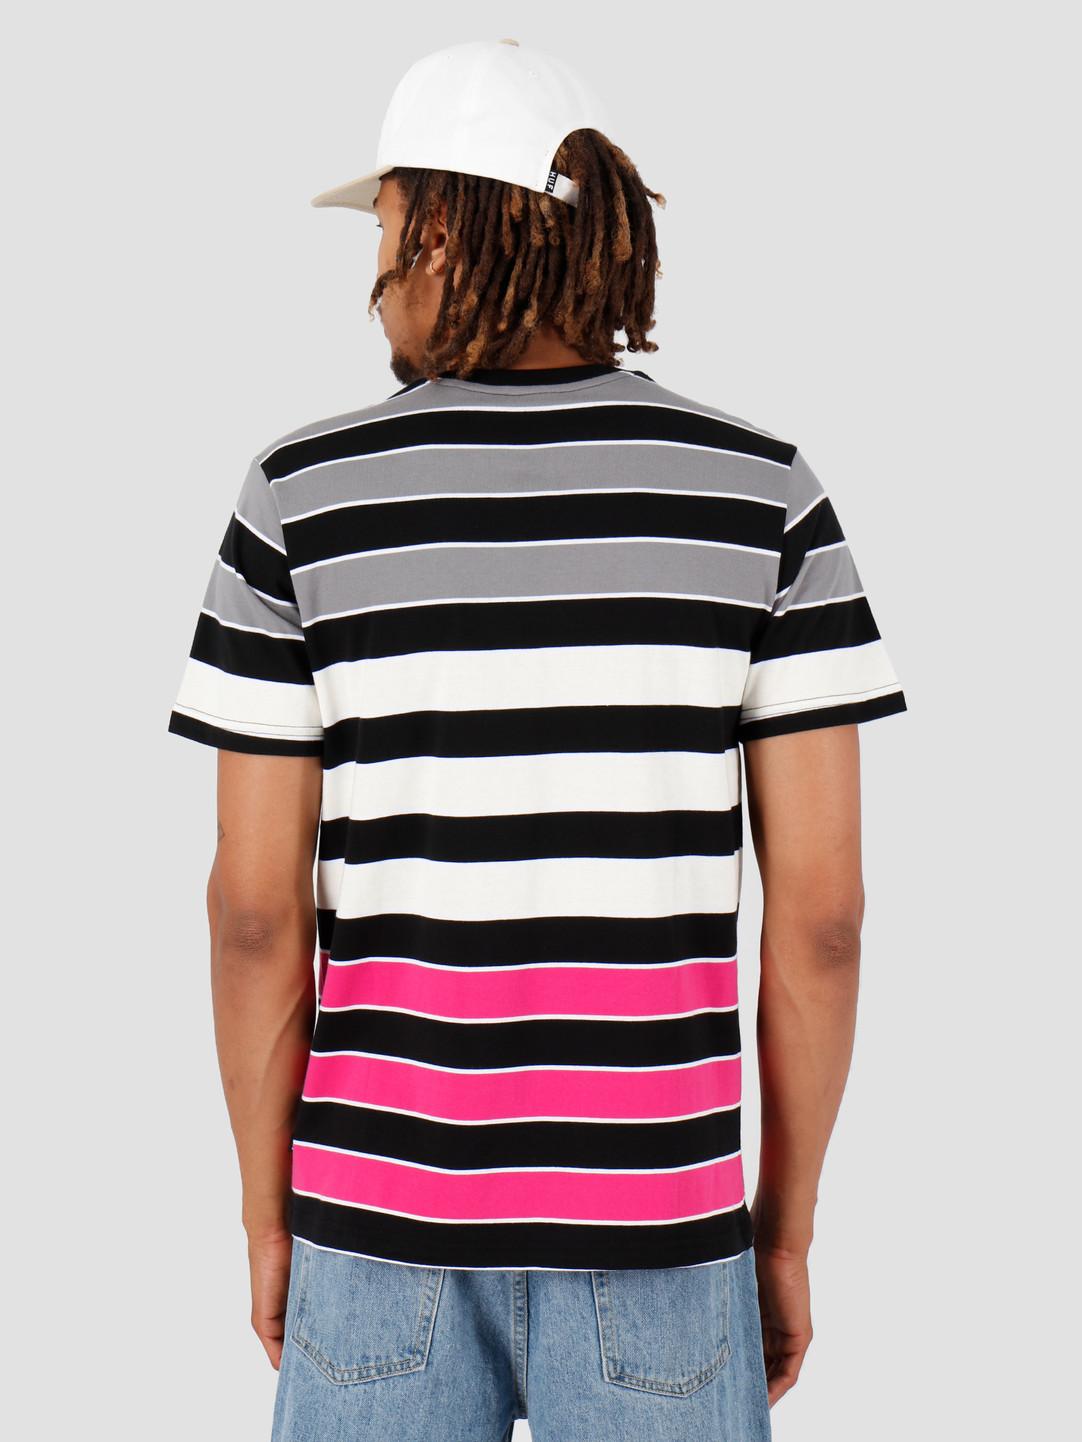 HUF HUF Variant Shortsleeve Knit Top Black KN00101